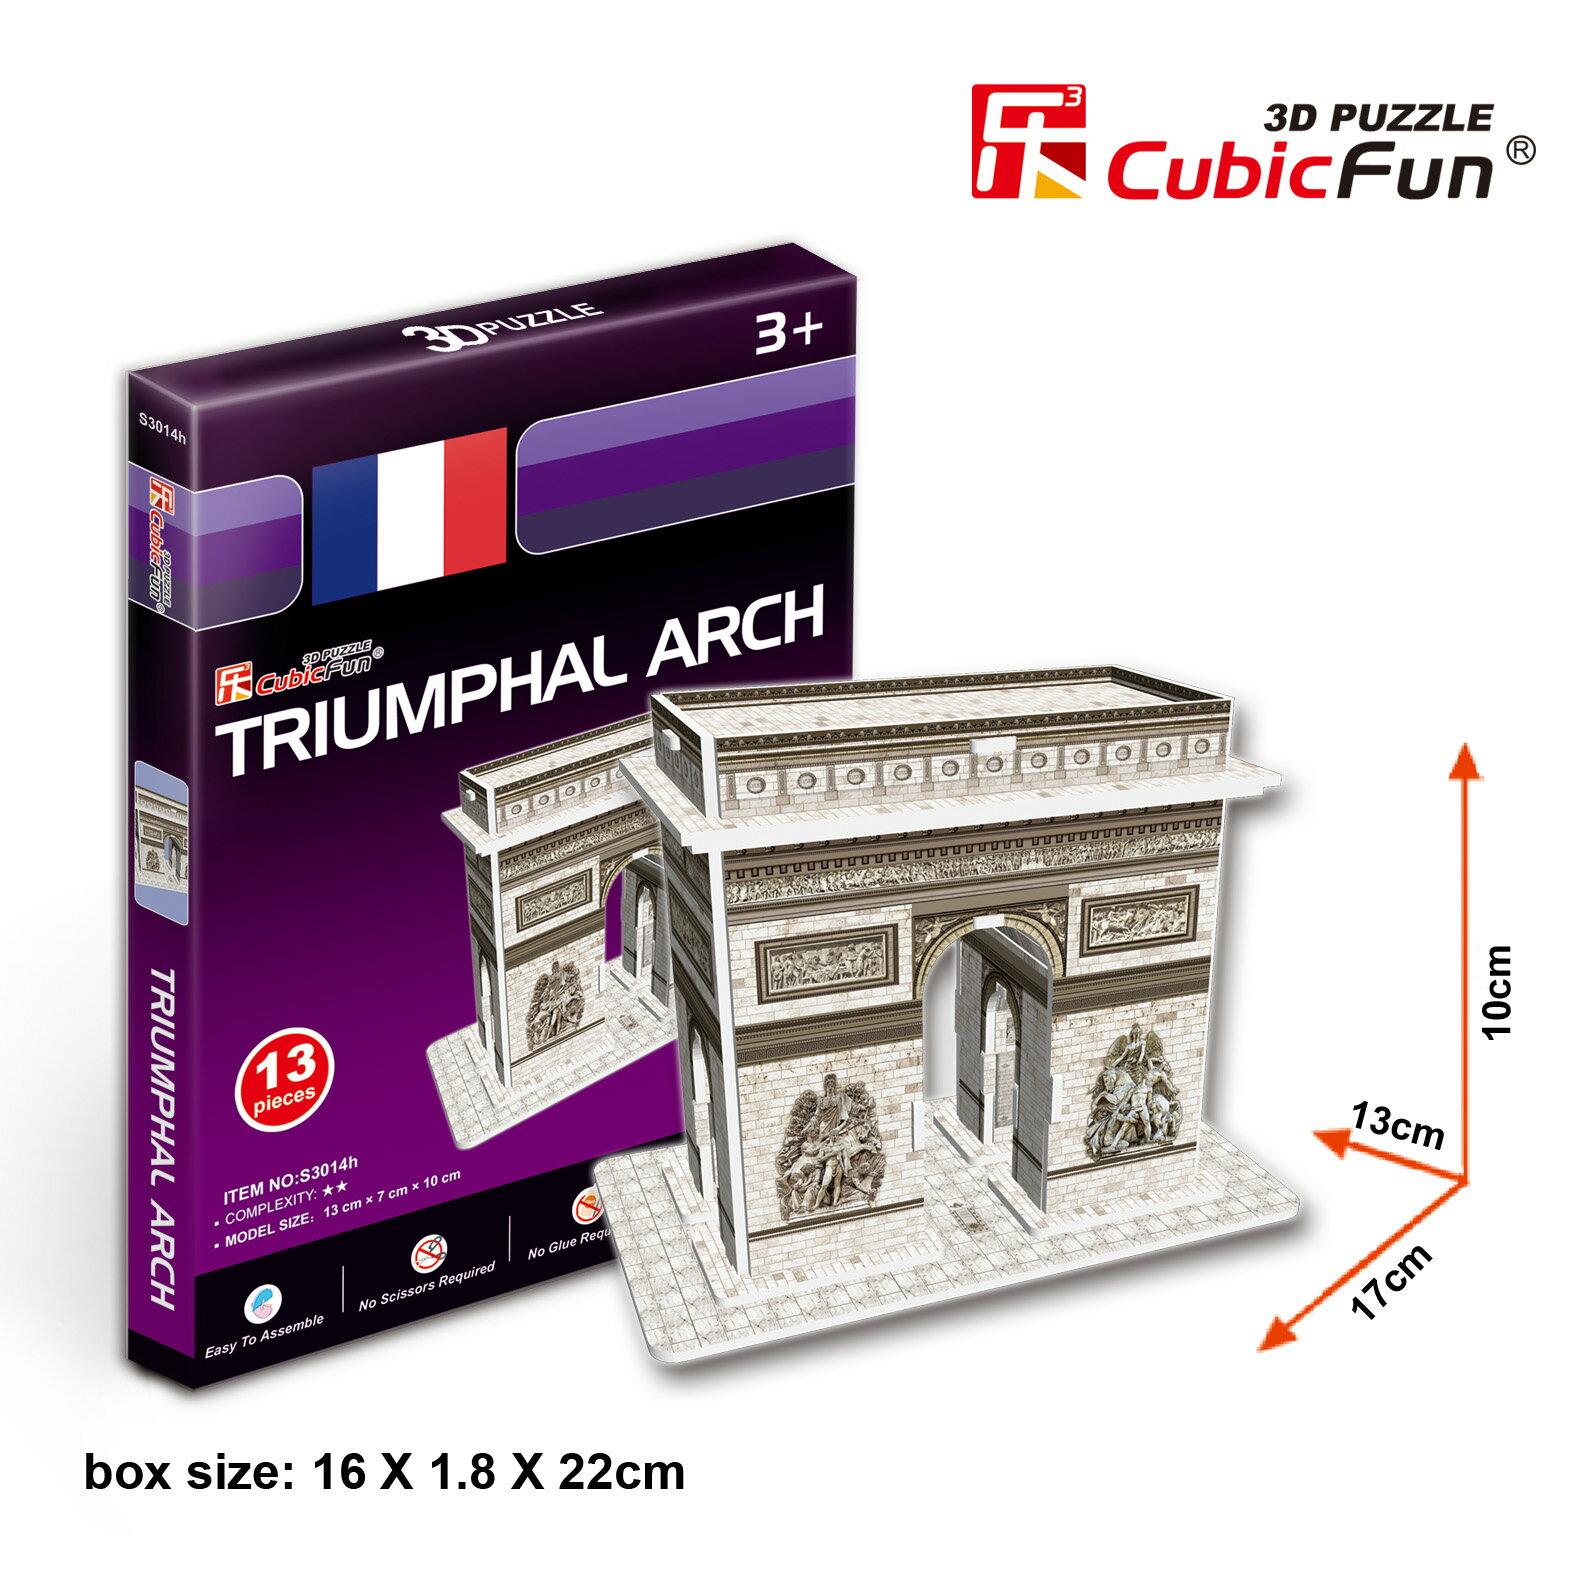 3D Puzzle 立體拼圖 - 迷你世界建築 【法國凱旋門】S3014 兒童級 13片